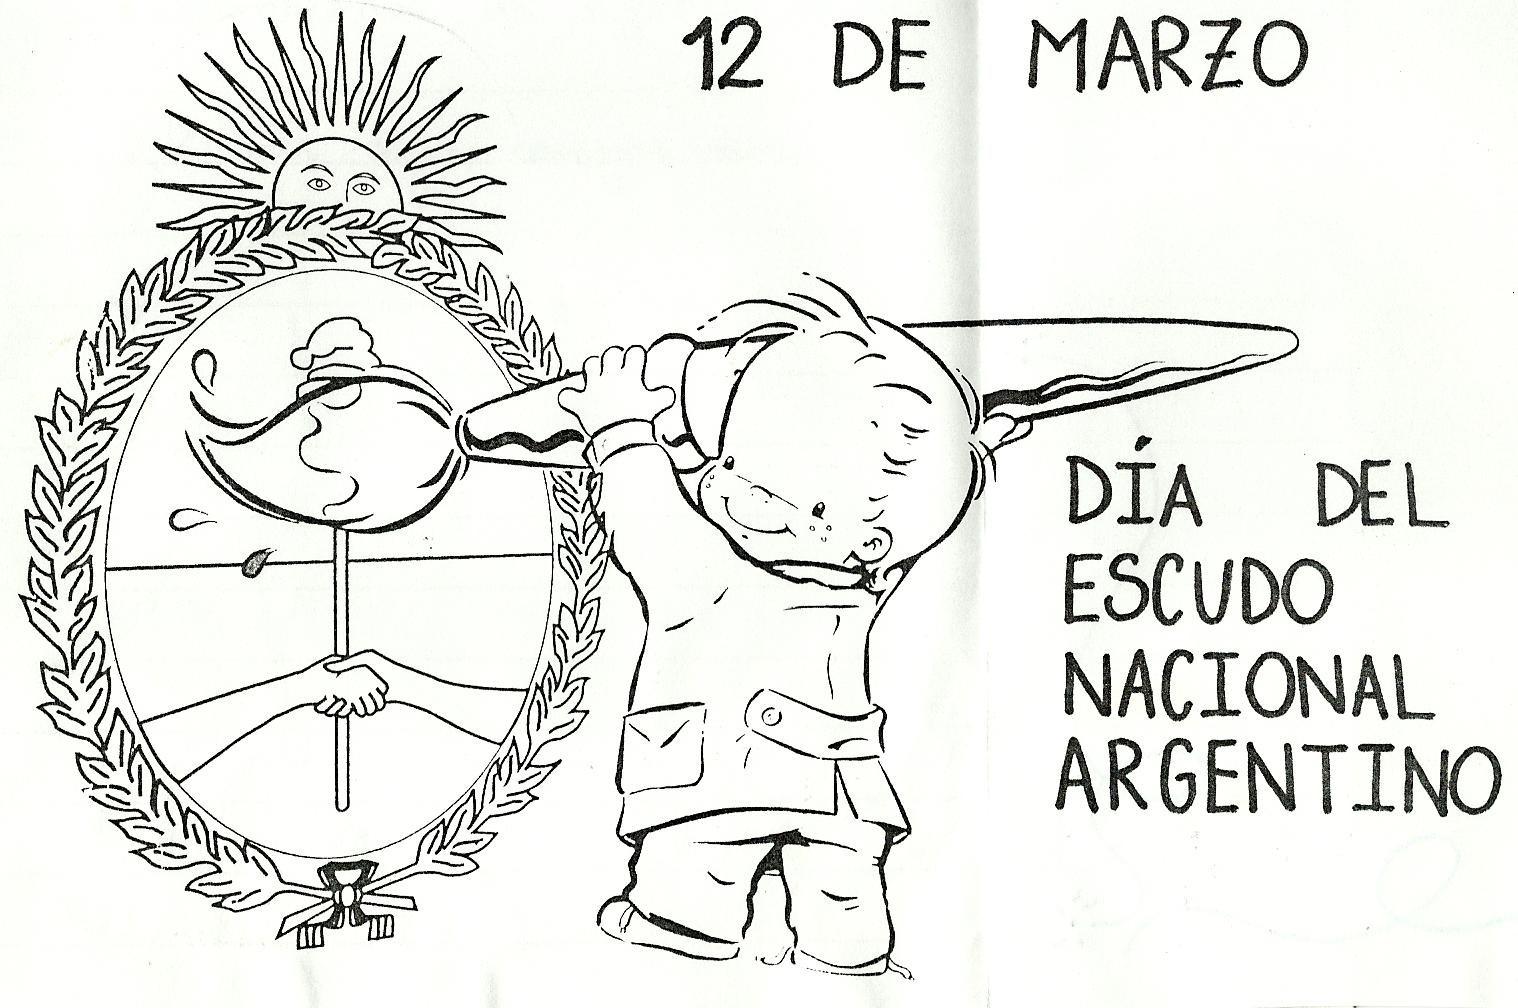 Negro Escudo Nacional Argentino Para Colorear Marzo Dia Del